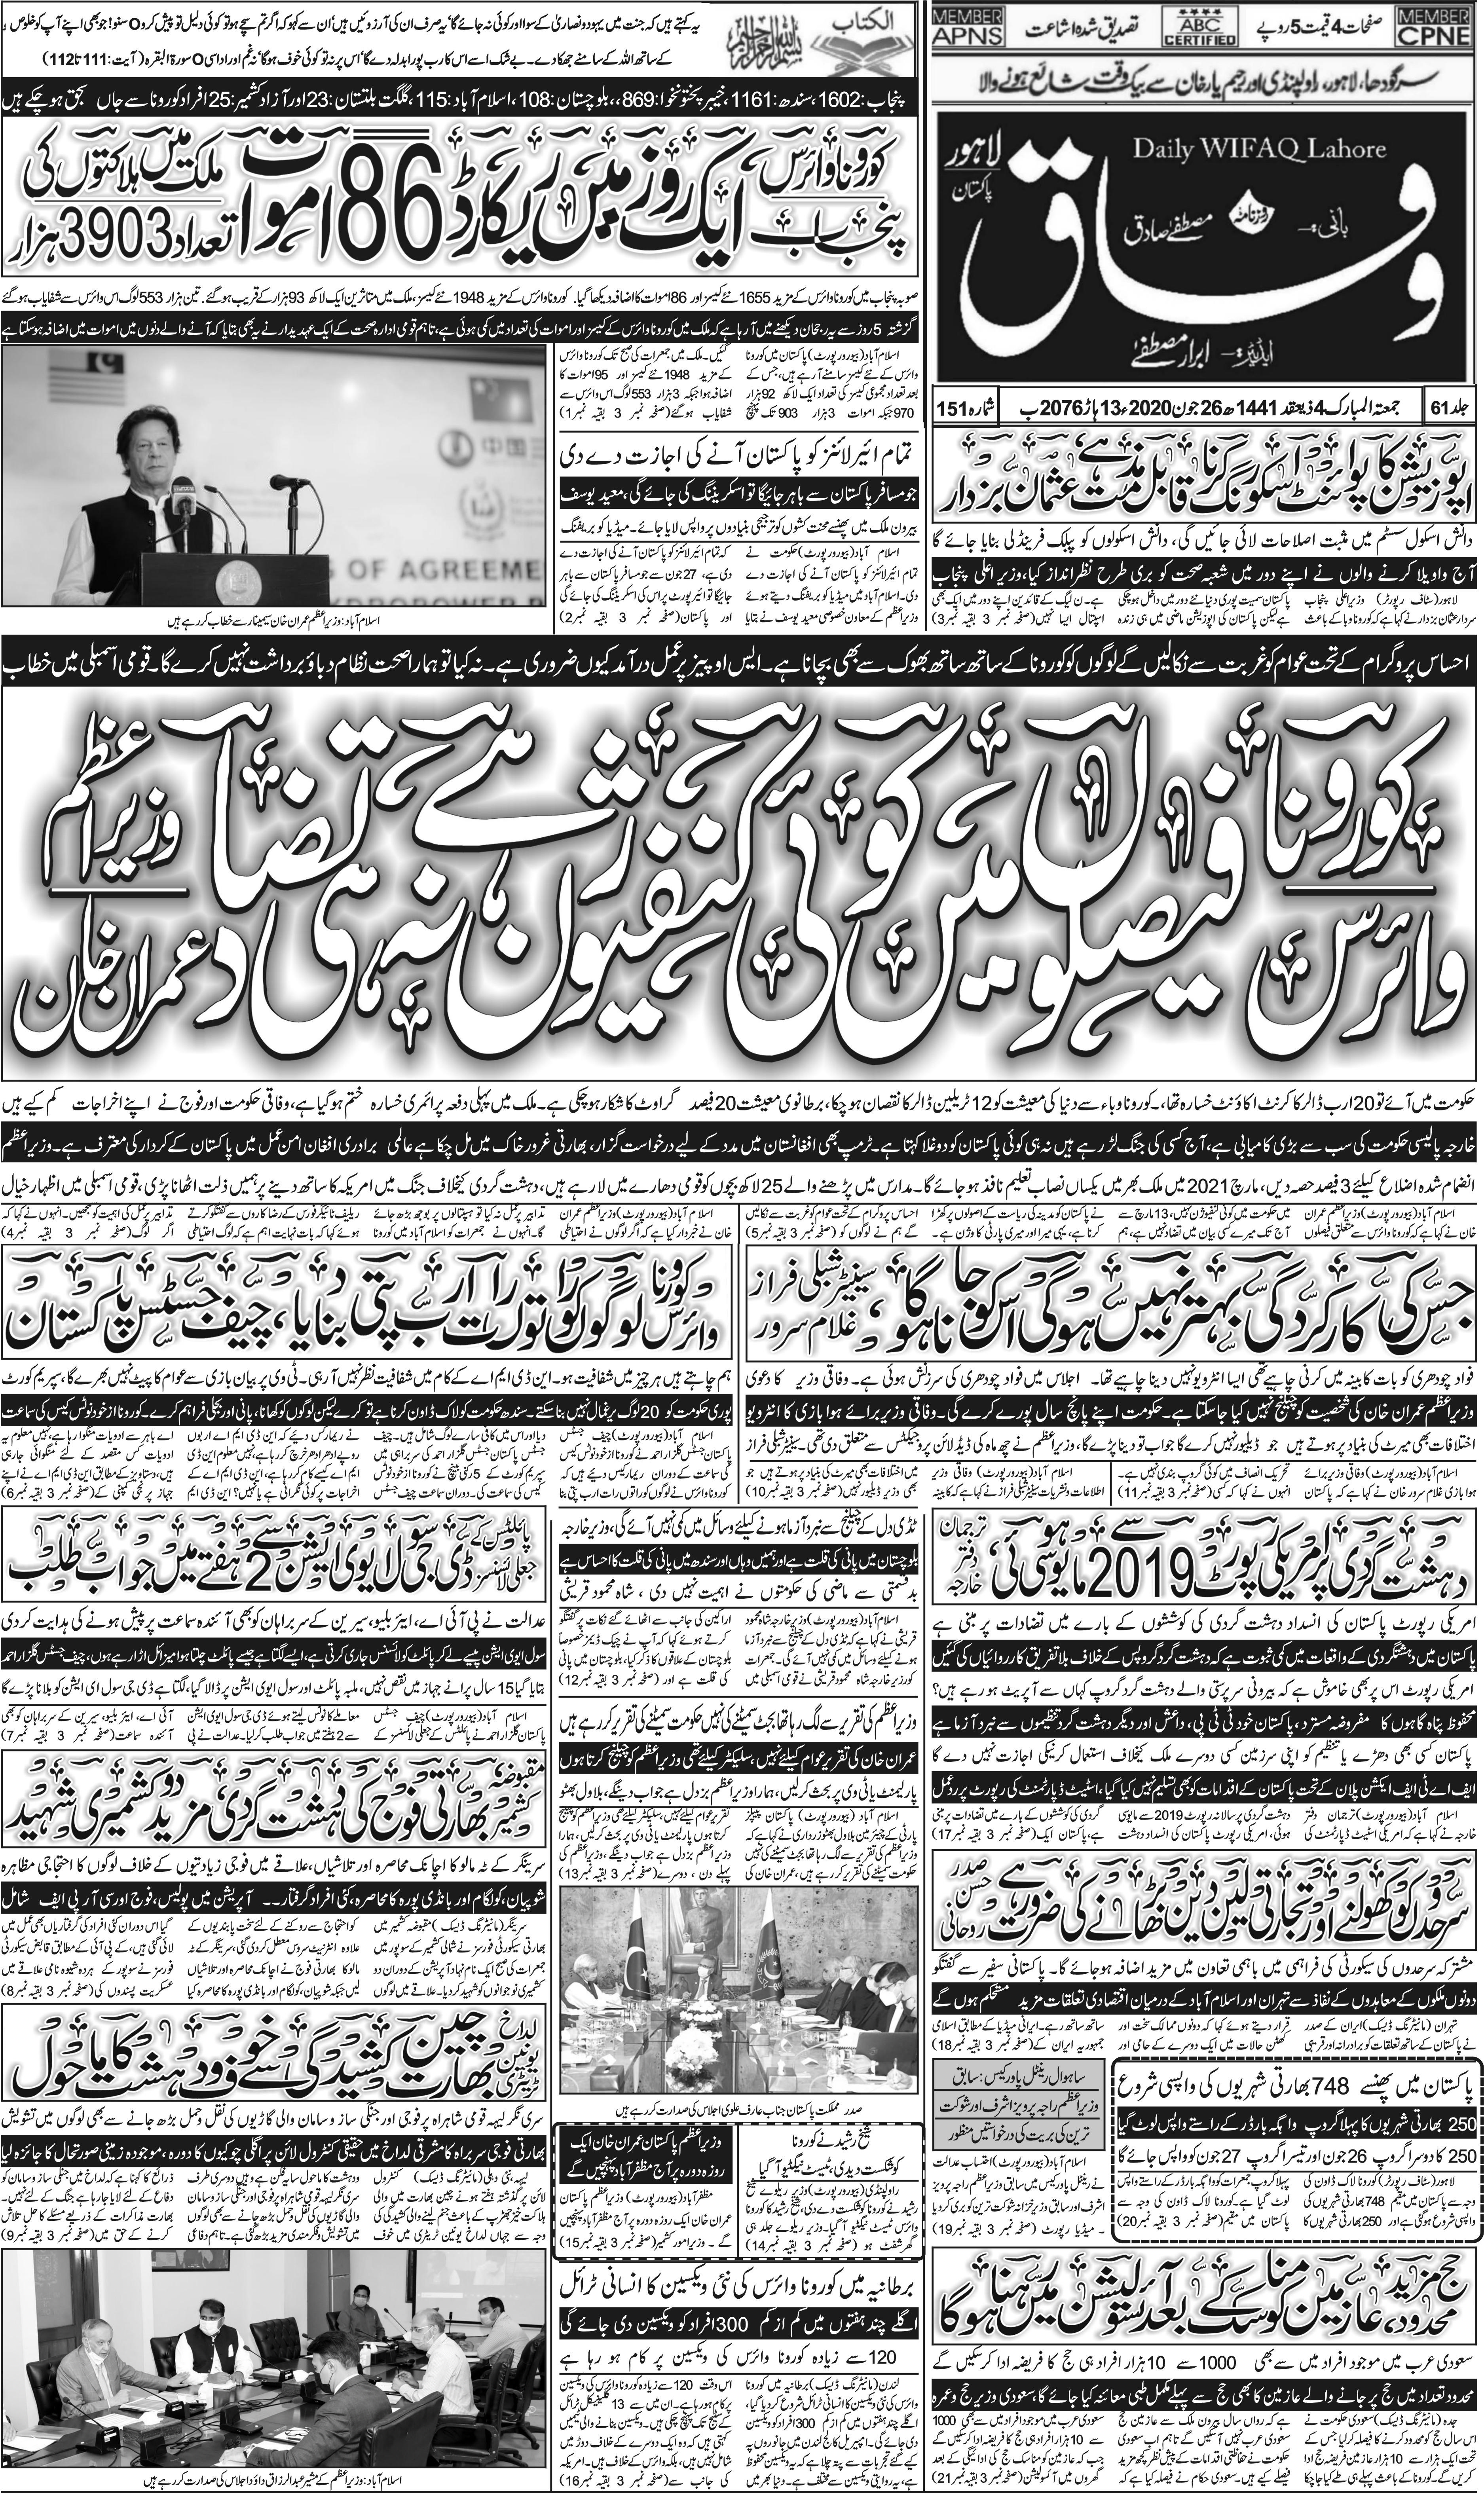 e-Paper – Daily Wifaq – Lahore – 26-06-2020